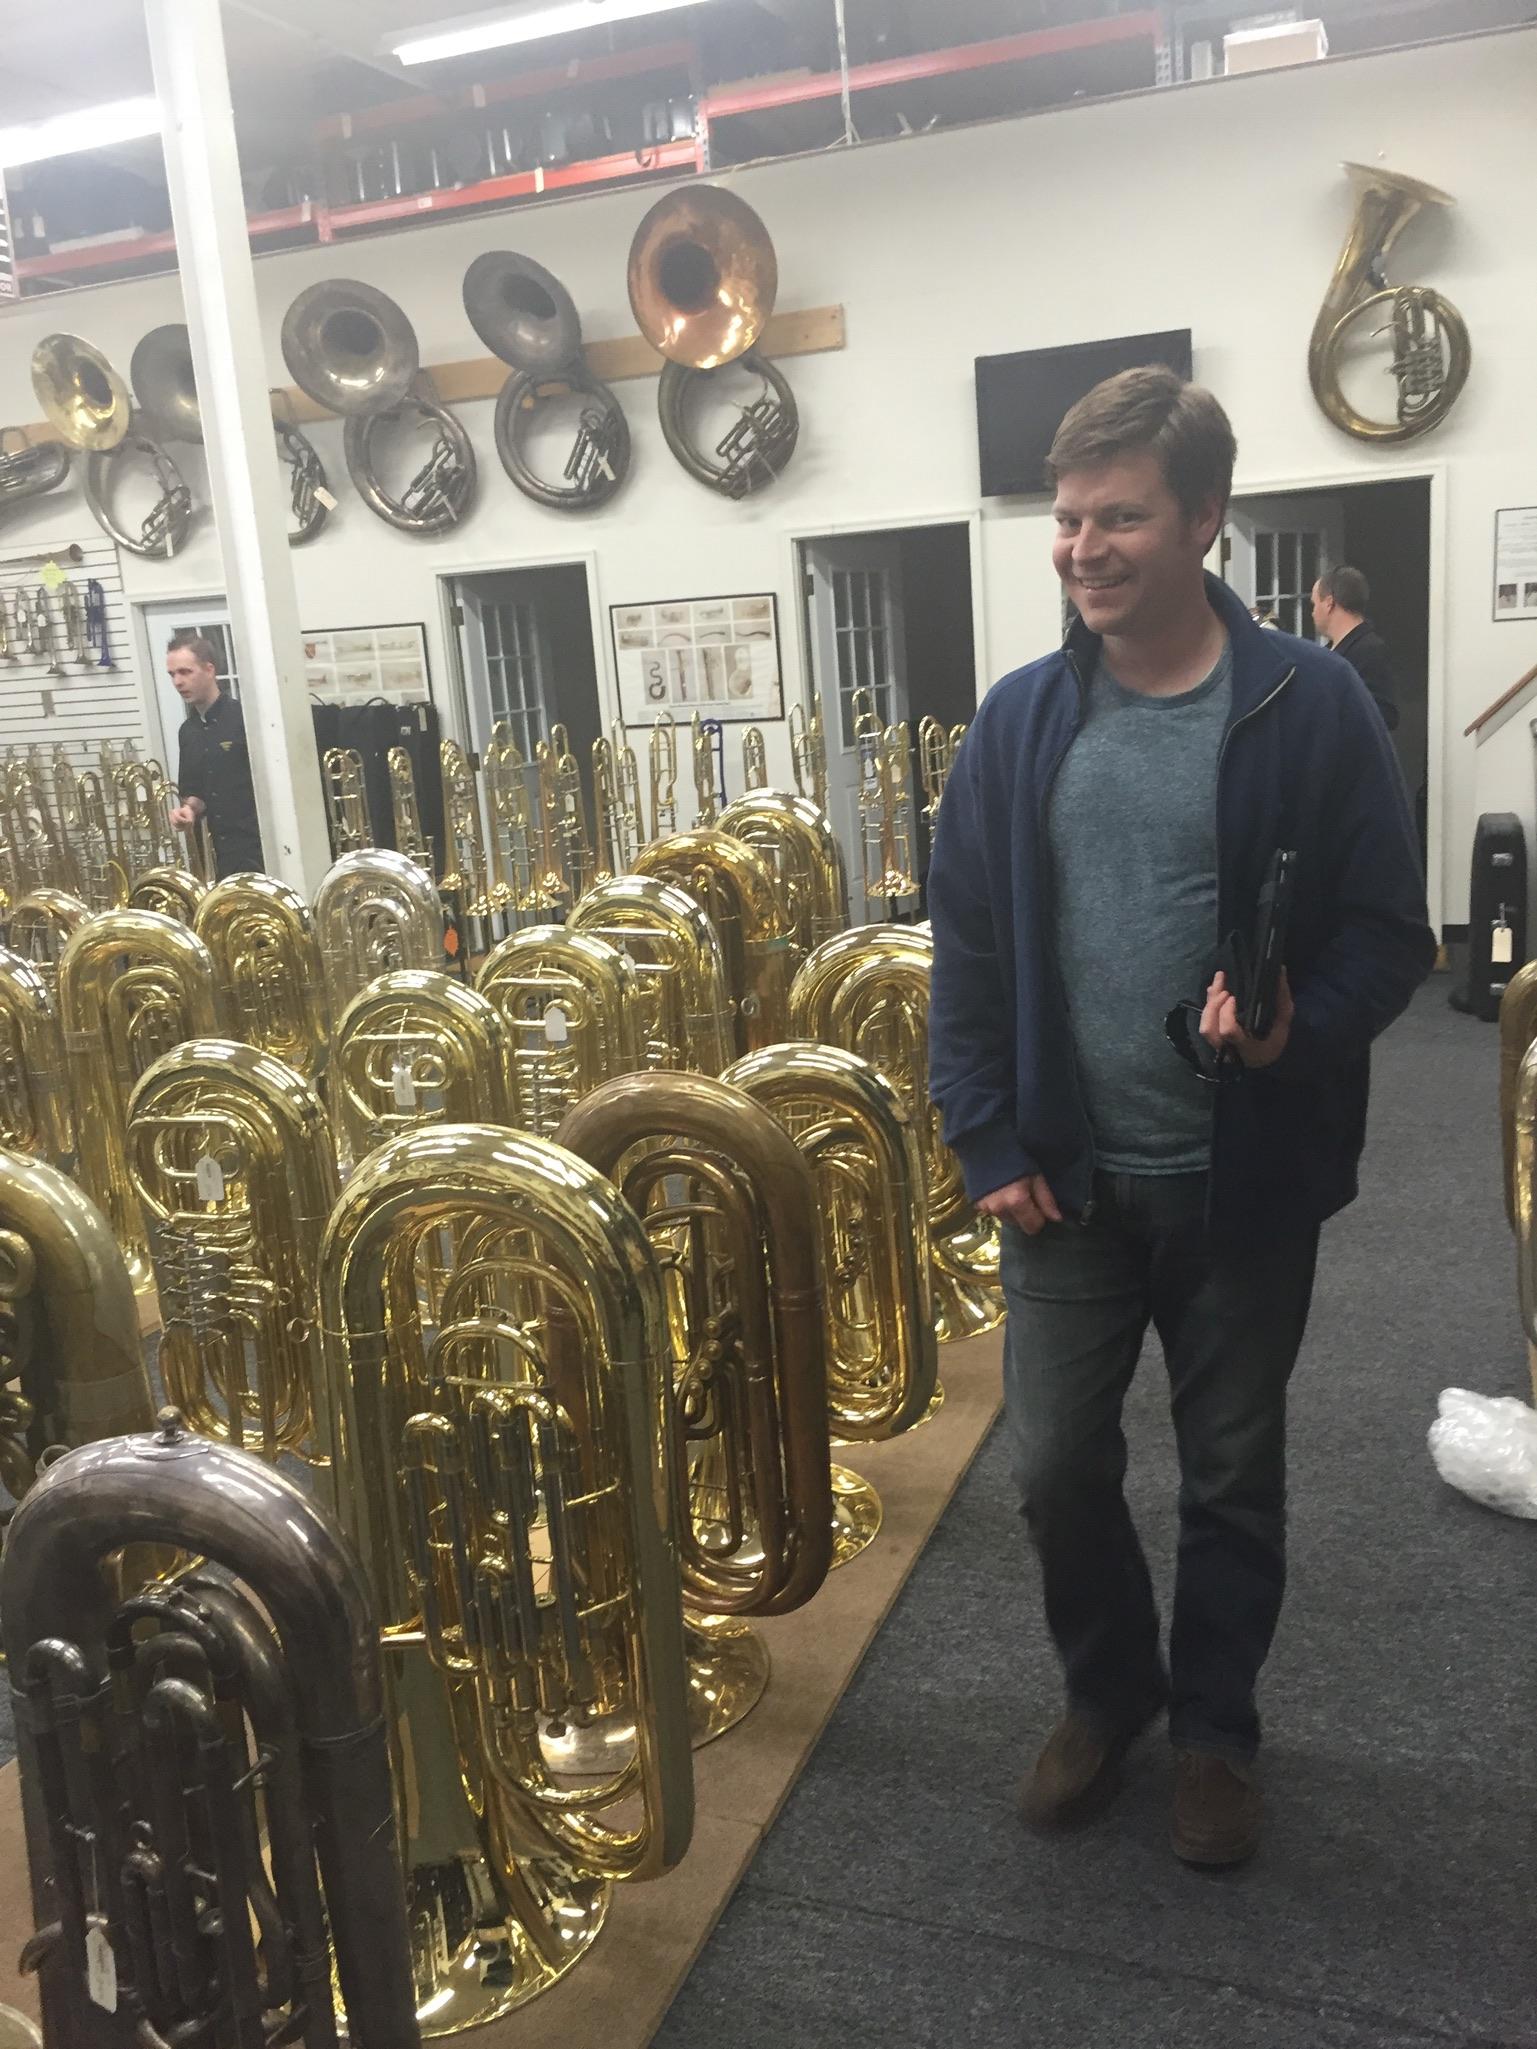 Having fun at Baltimore Brass Company.